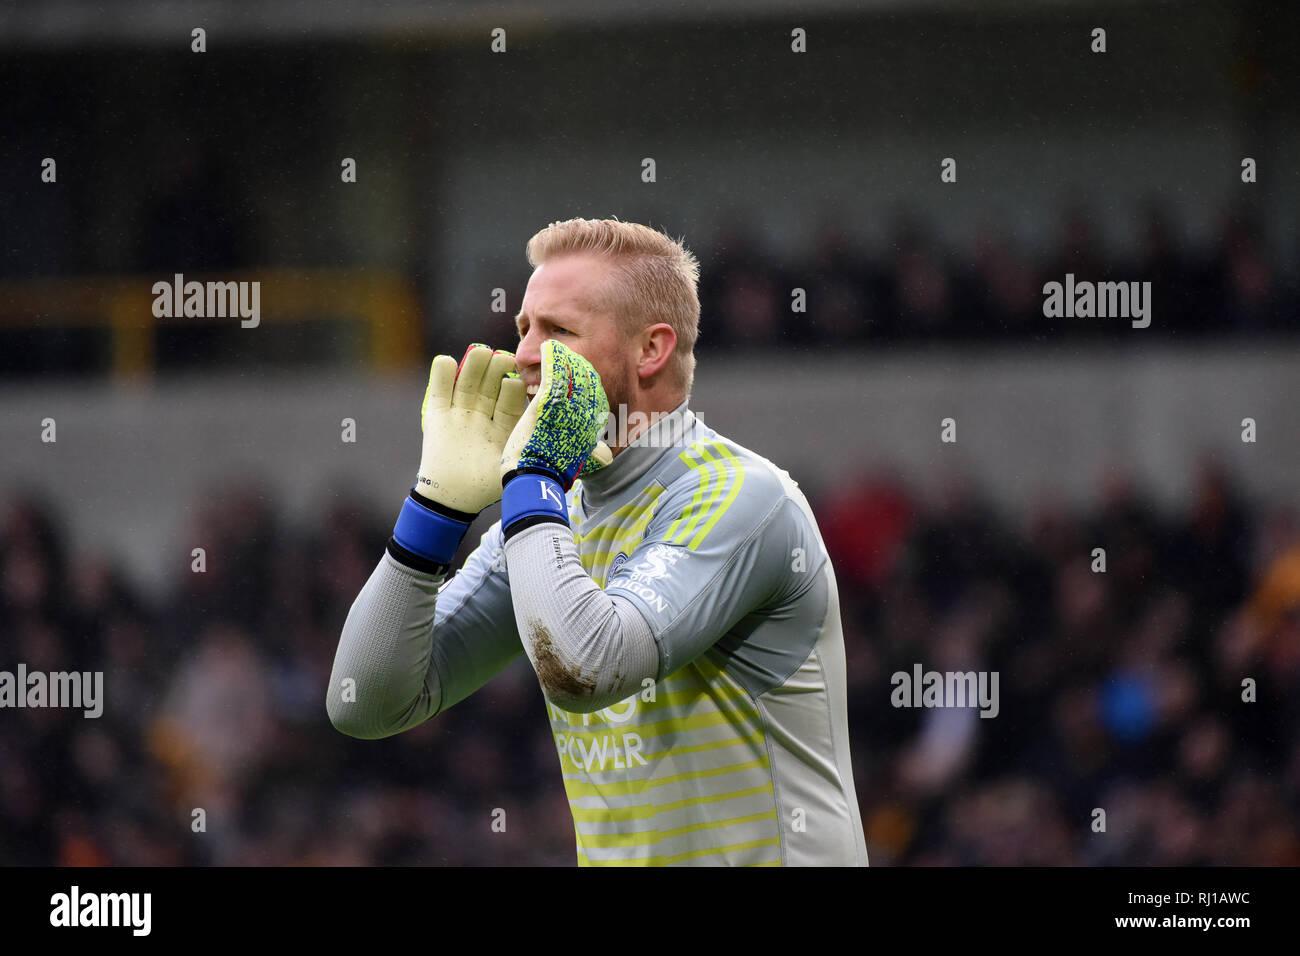 Danish goalkeeper footballer Kasper Schmeichel Stock Photo